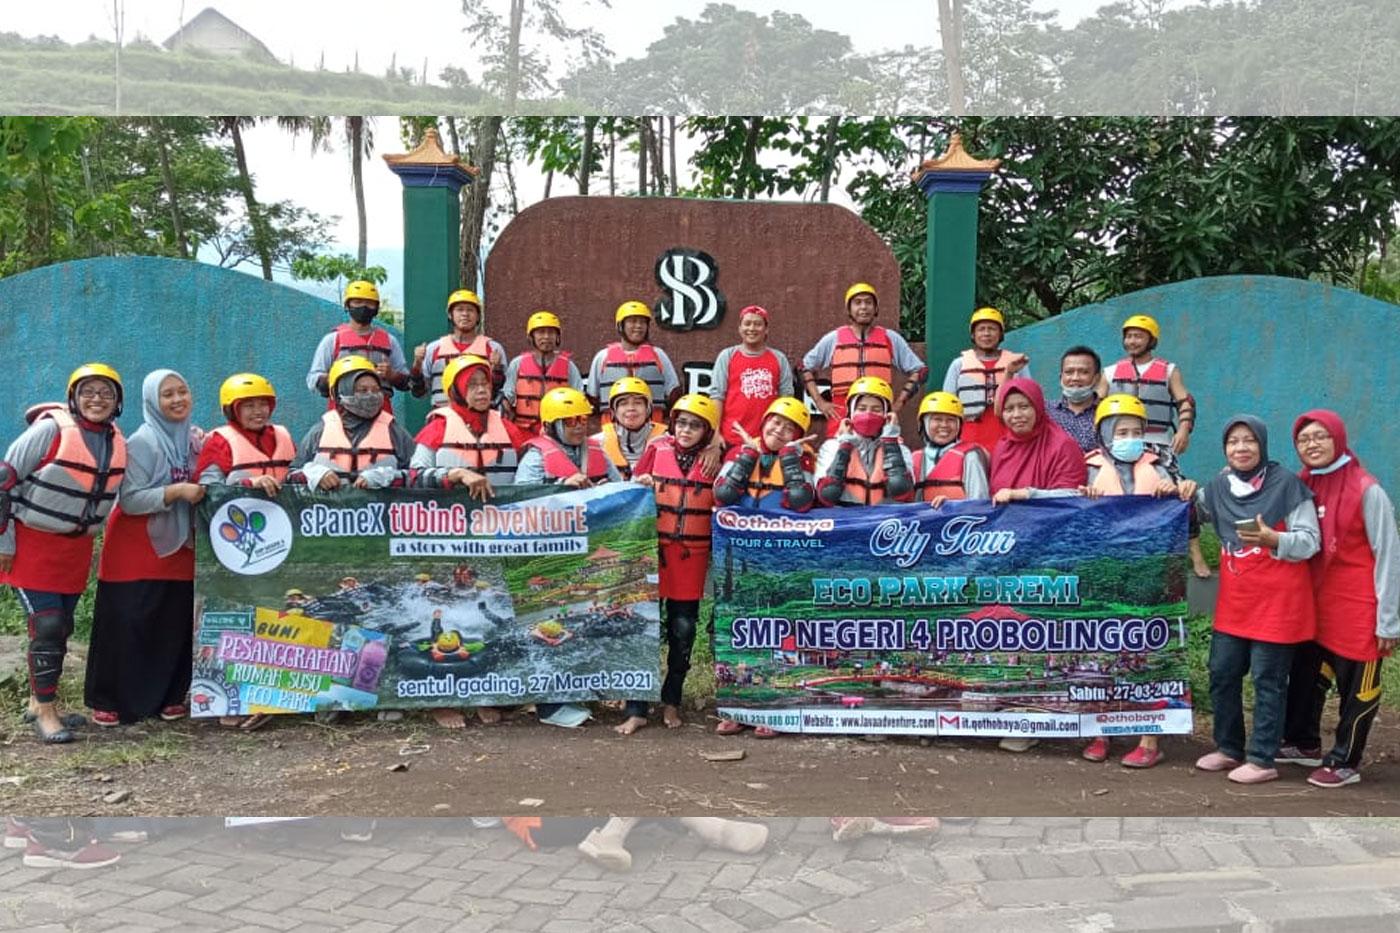 SMPN4 03